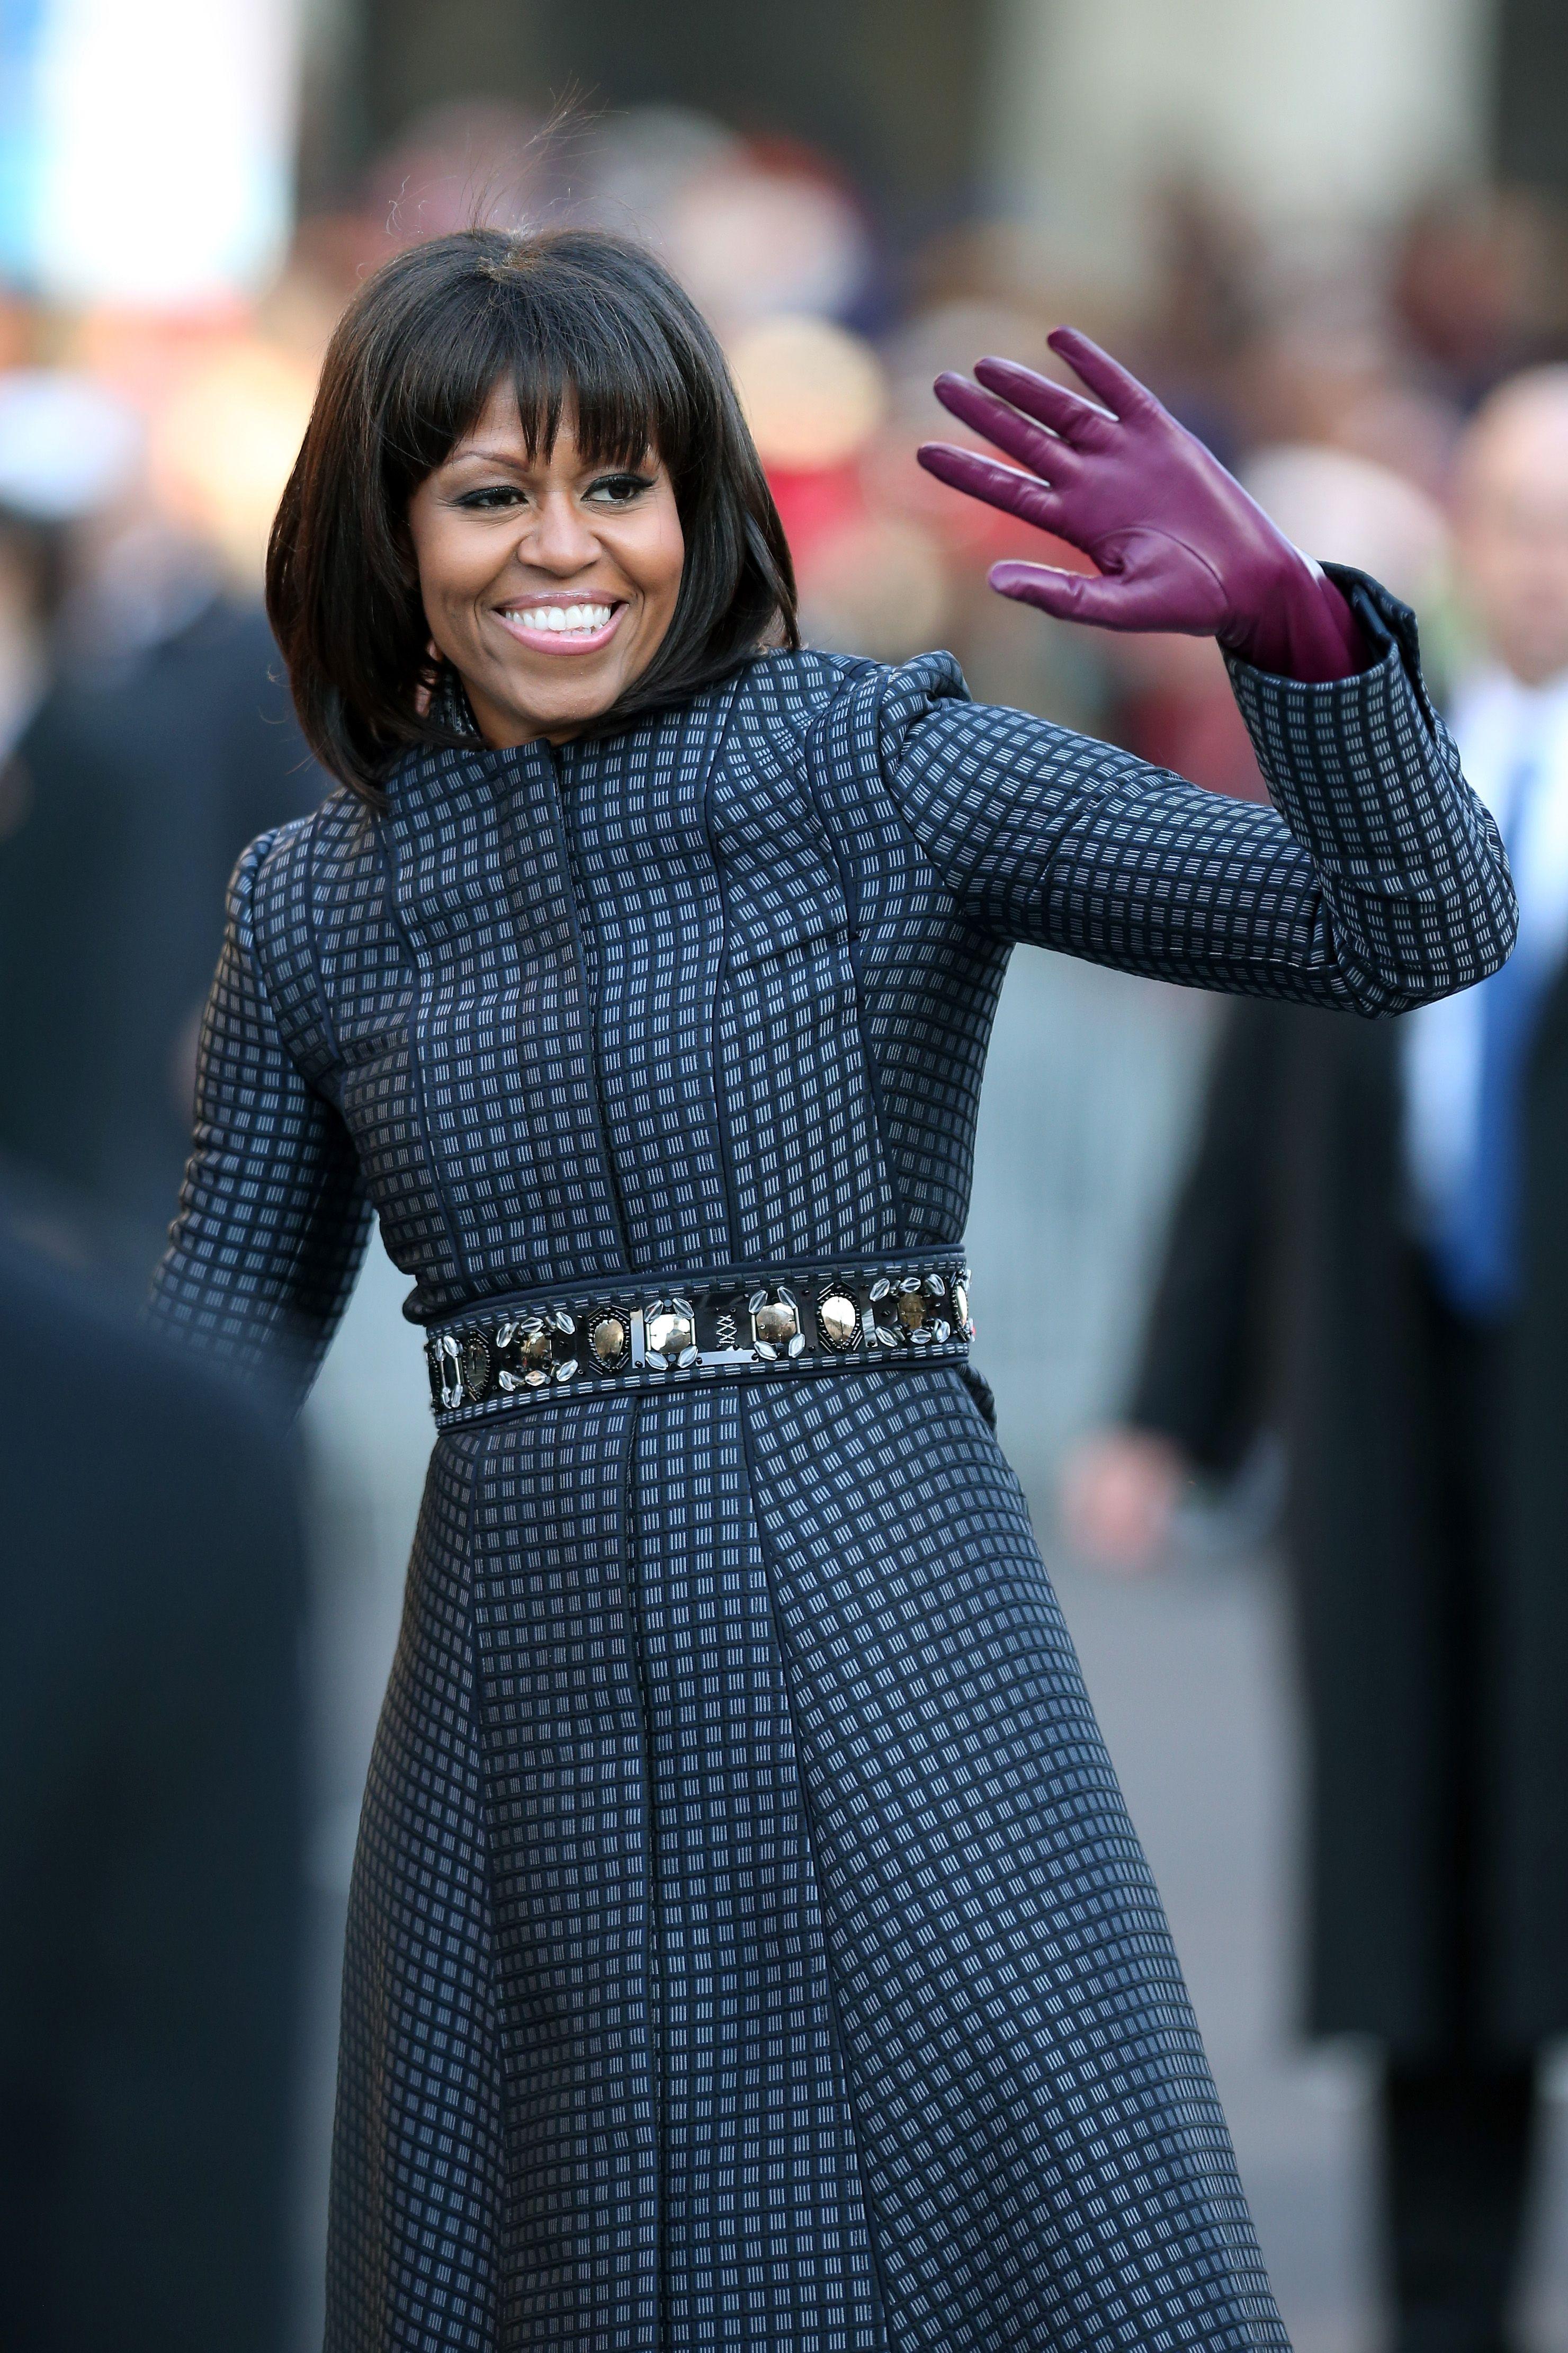 Michelle Obama wearing Thom Browne